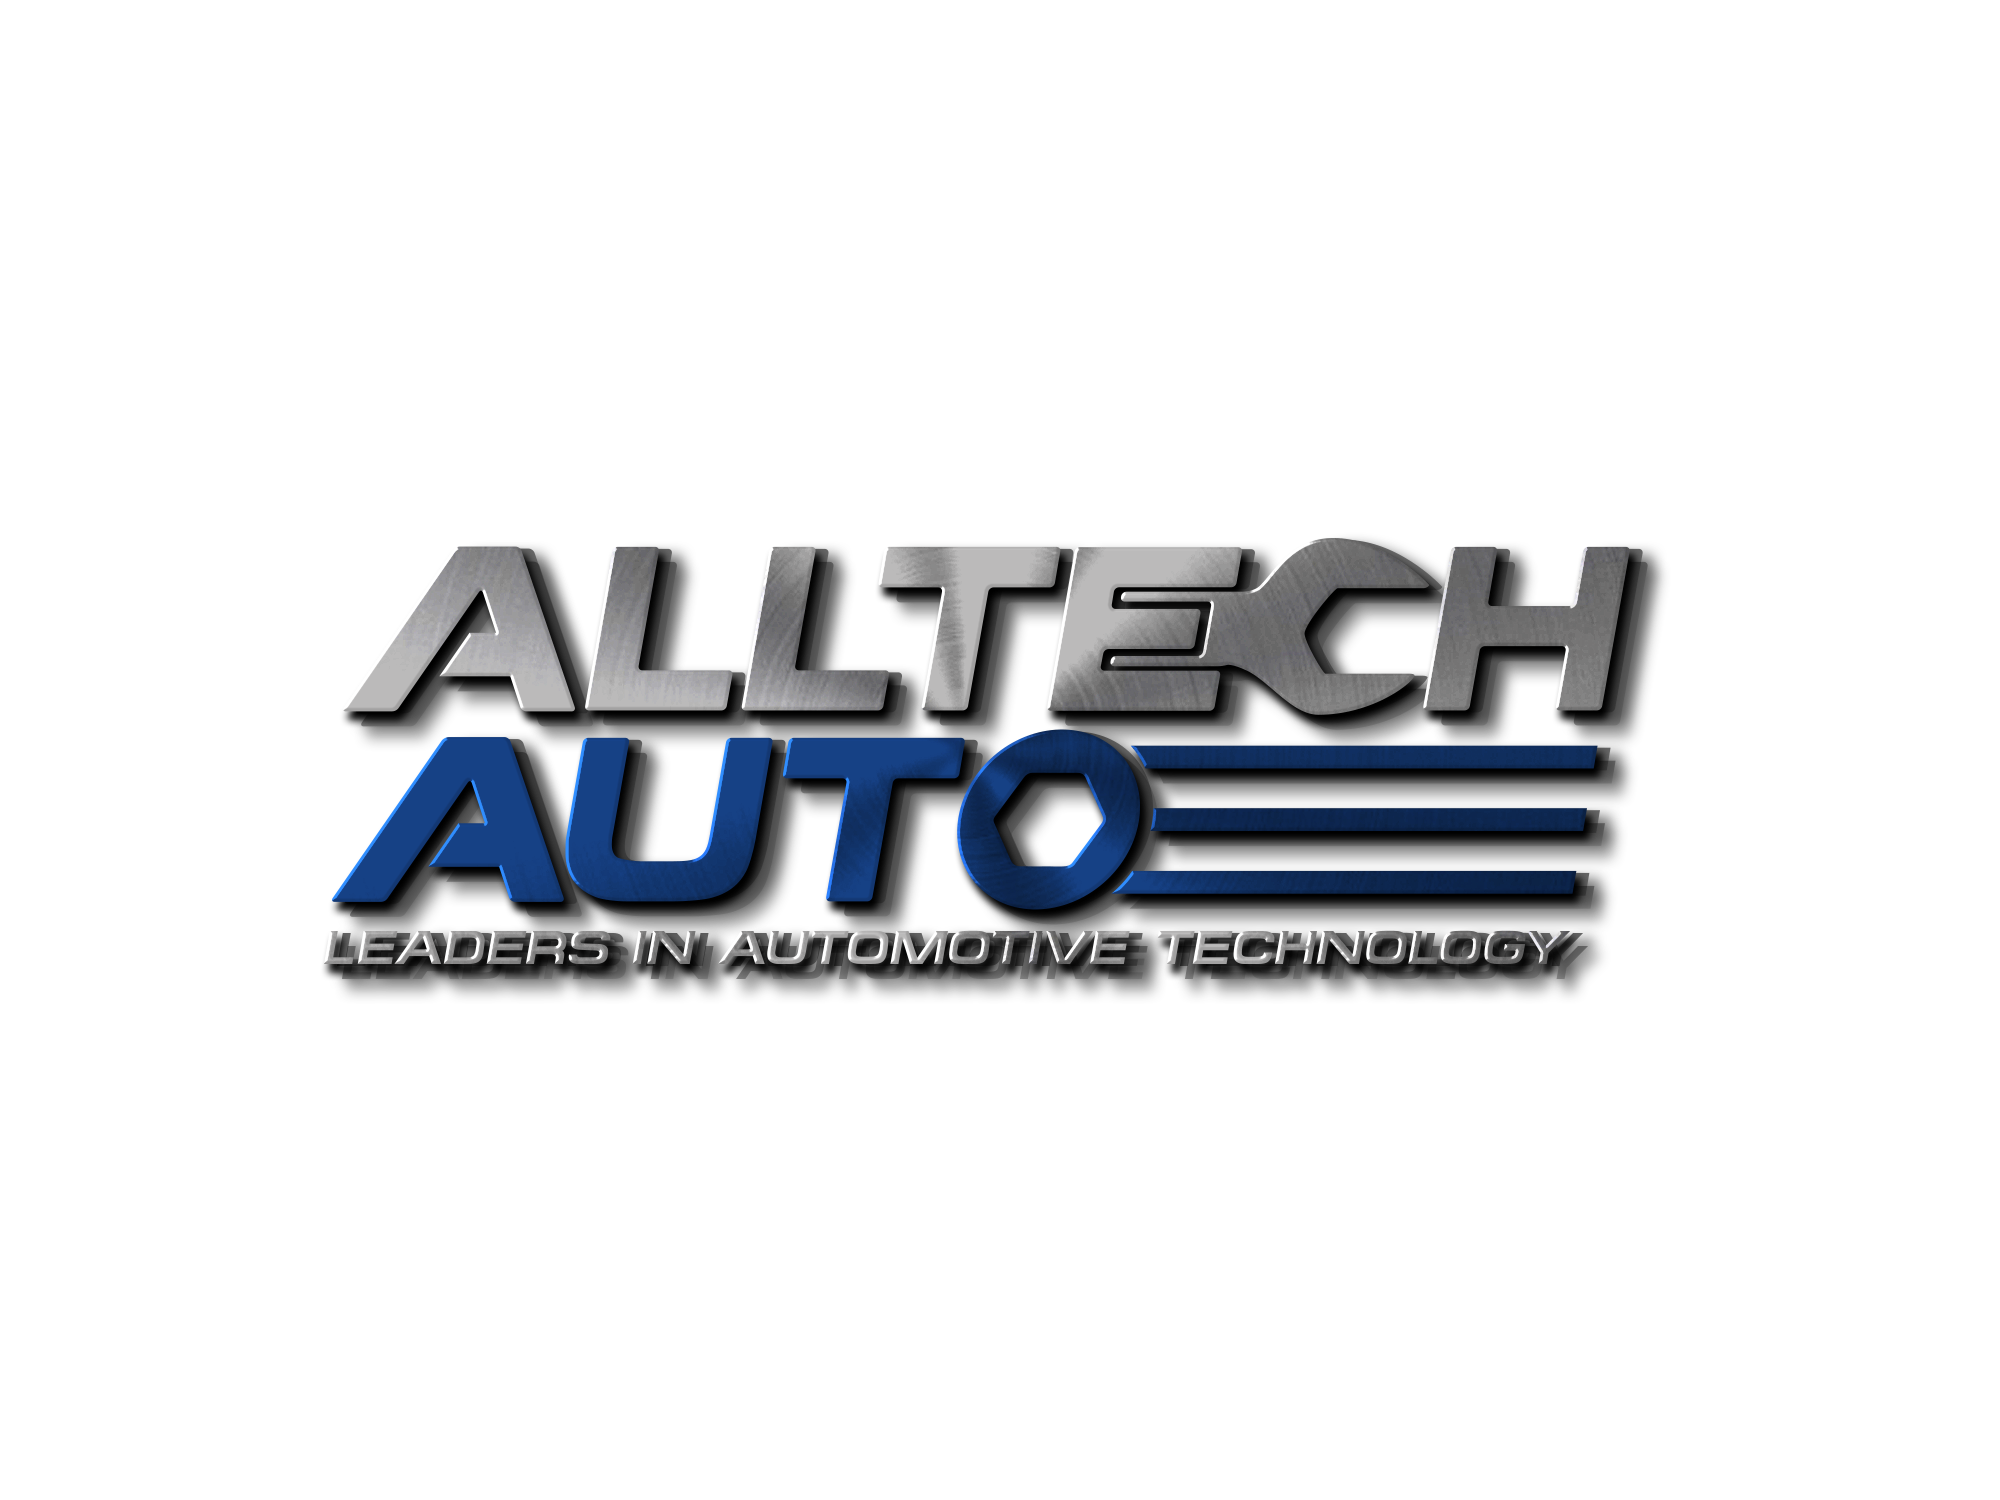 AllTech Auto